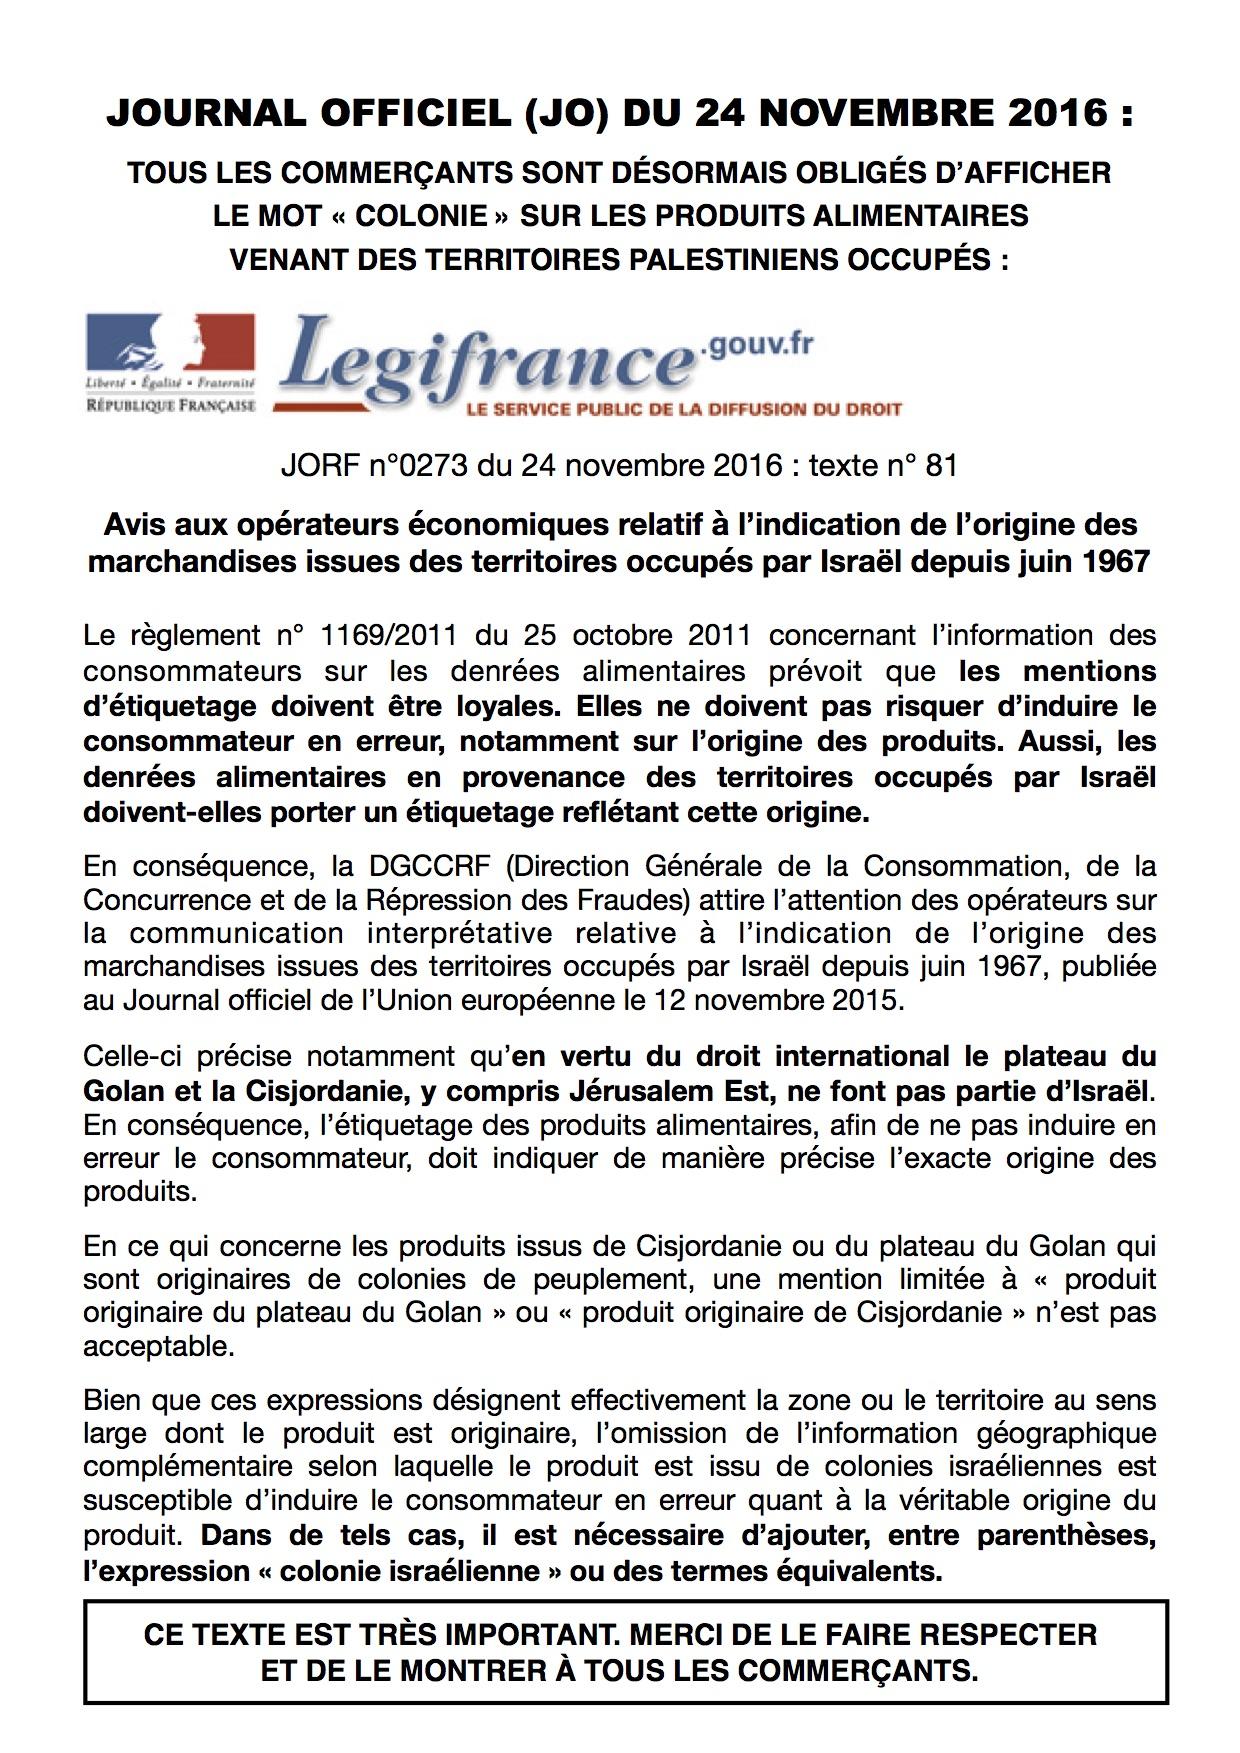 _journal_officiel_grand_format-9.jpg